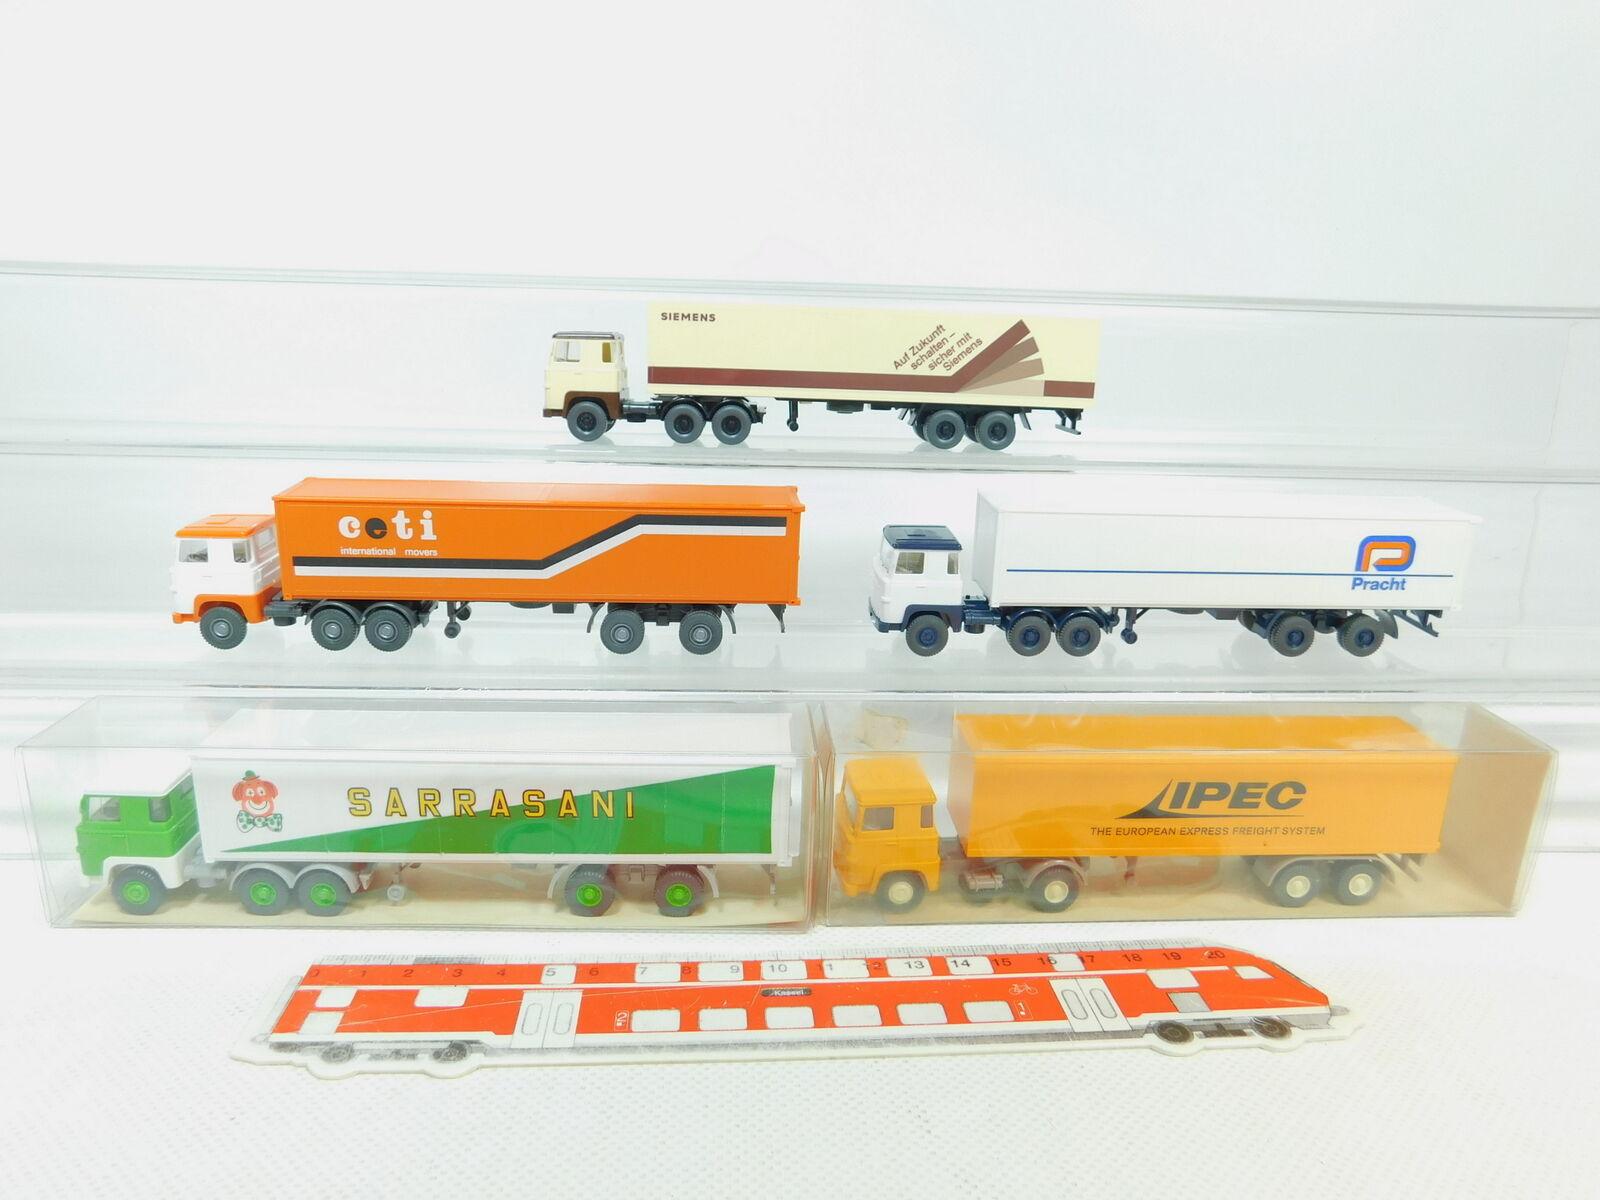 BN83-0,5x Wiking H0 1 87 LKW Scania  IPEC+Sarrasani+ceti+Pracht+Siemens NEUW